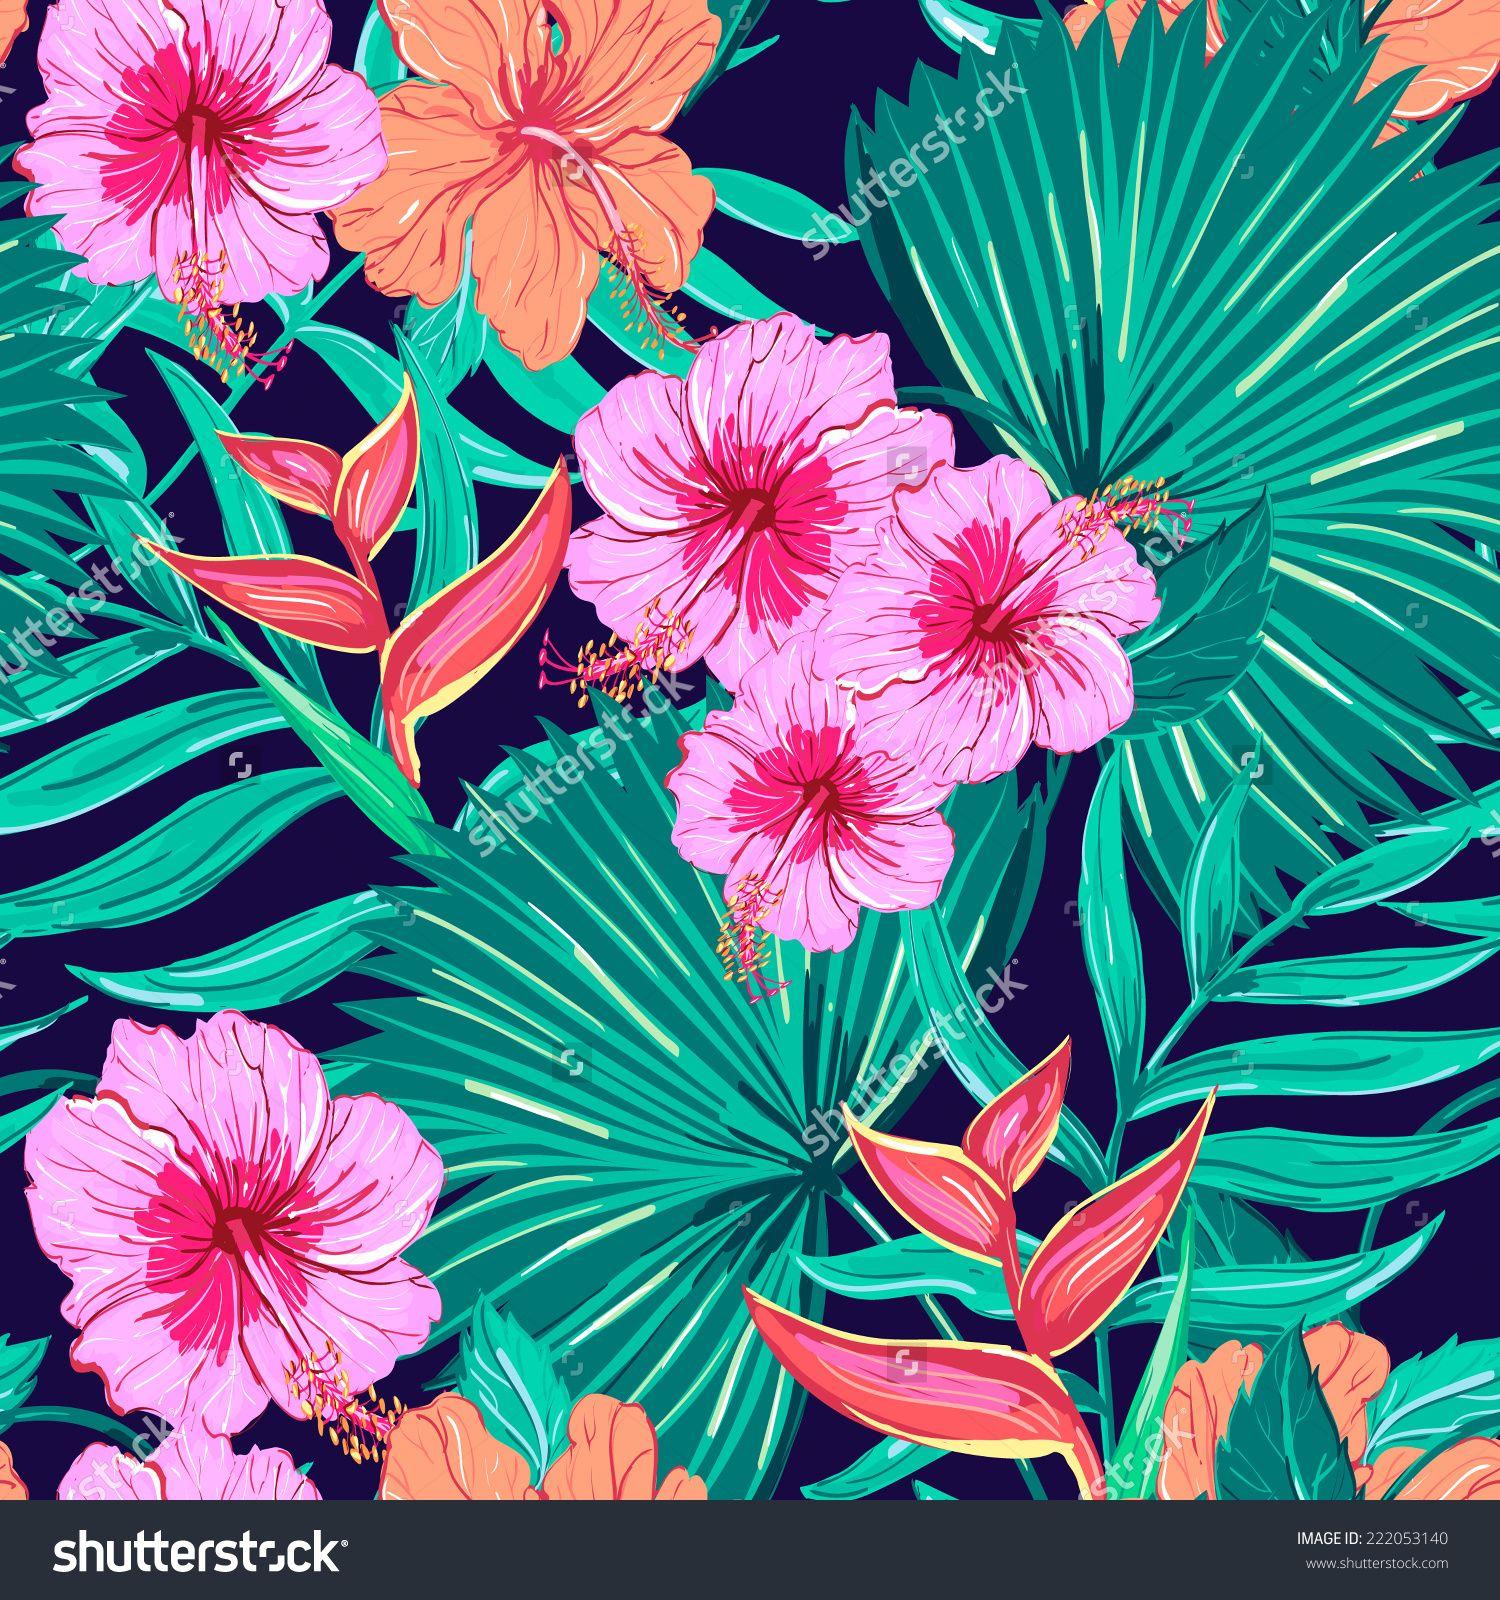 floral pattern - Buscar con Google